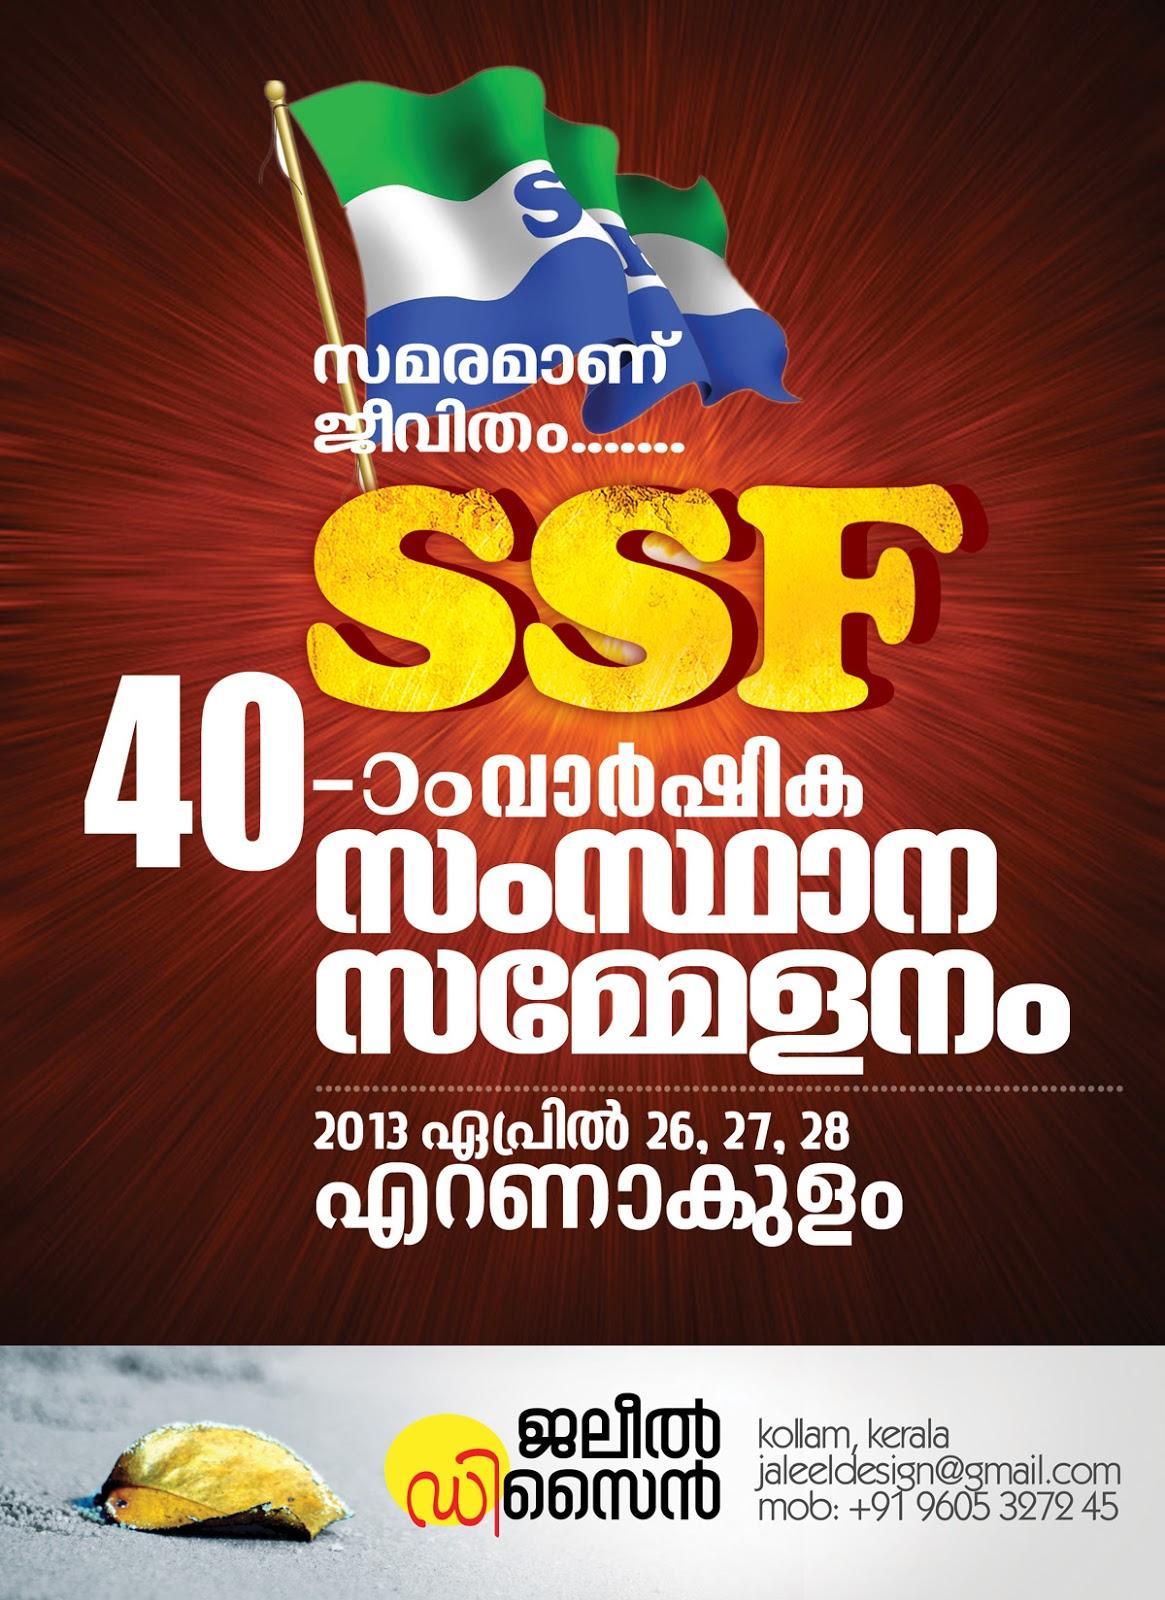 Ssf 40 varshikam anniversary conference designs photos for Ssf home designs